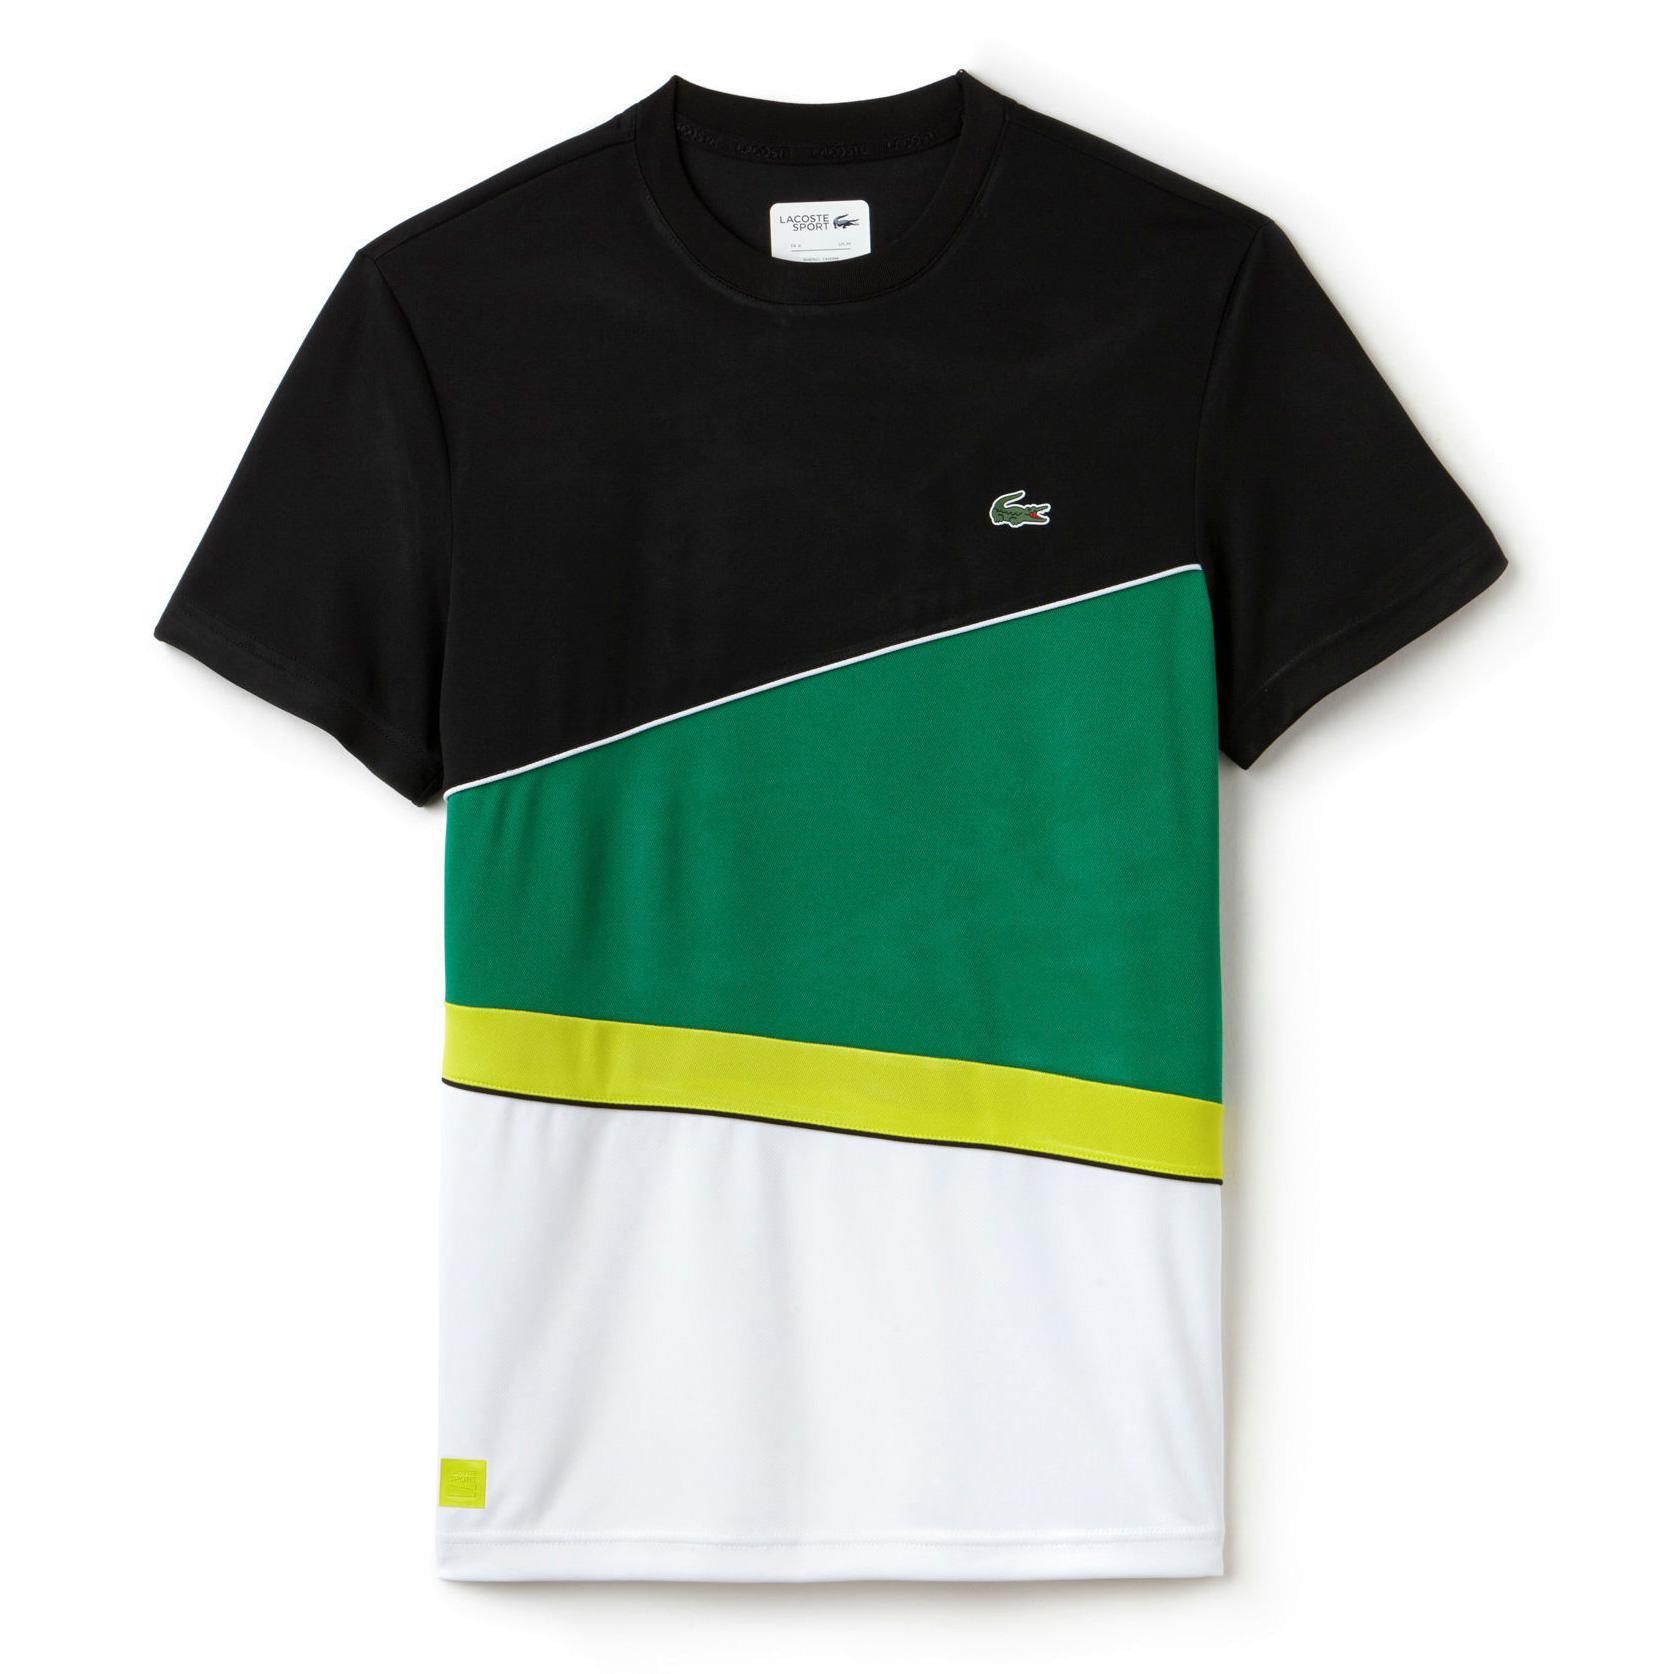 63c883f64d9 Lacoste Sport Mens Tennis Colourblock T-Shirt - Black/Green/White -  Tennisnuts.com